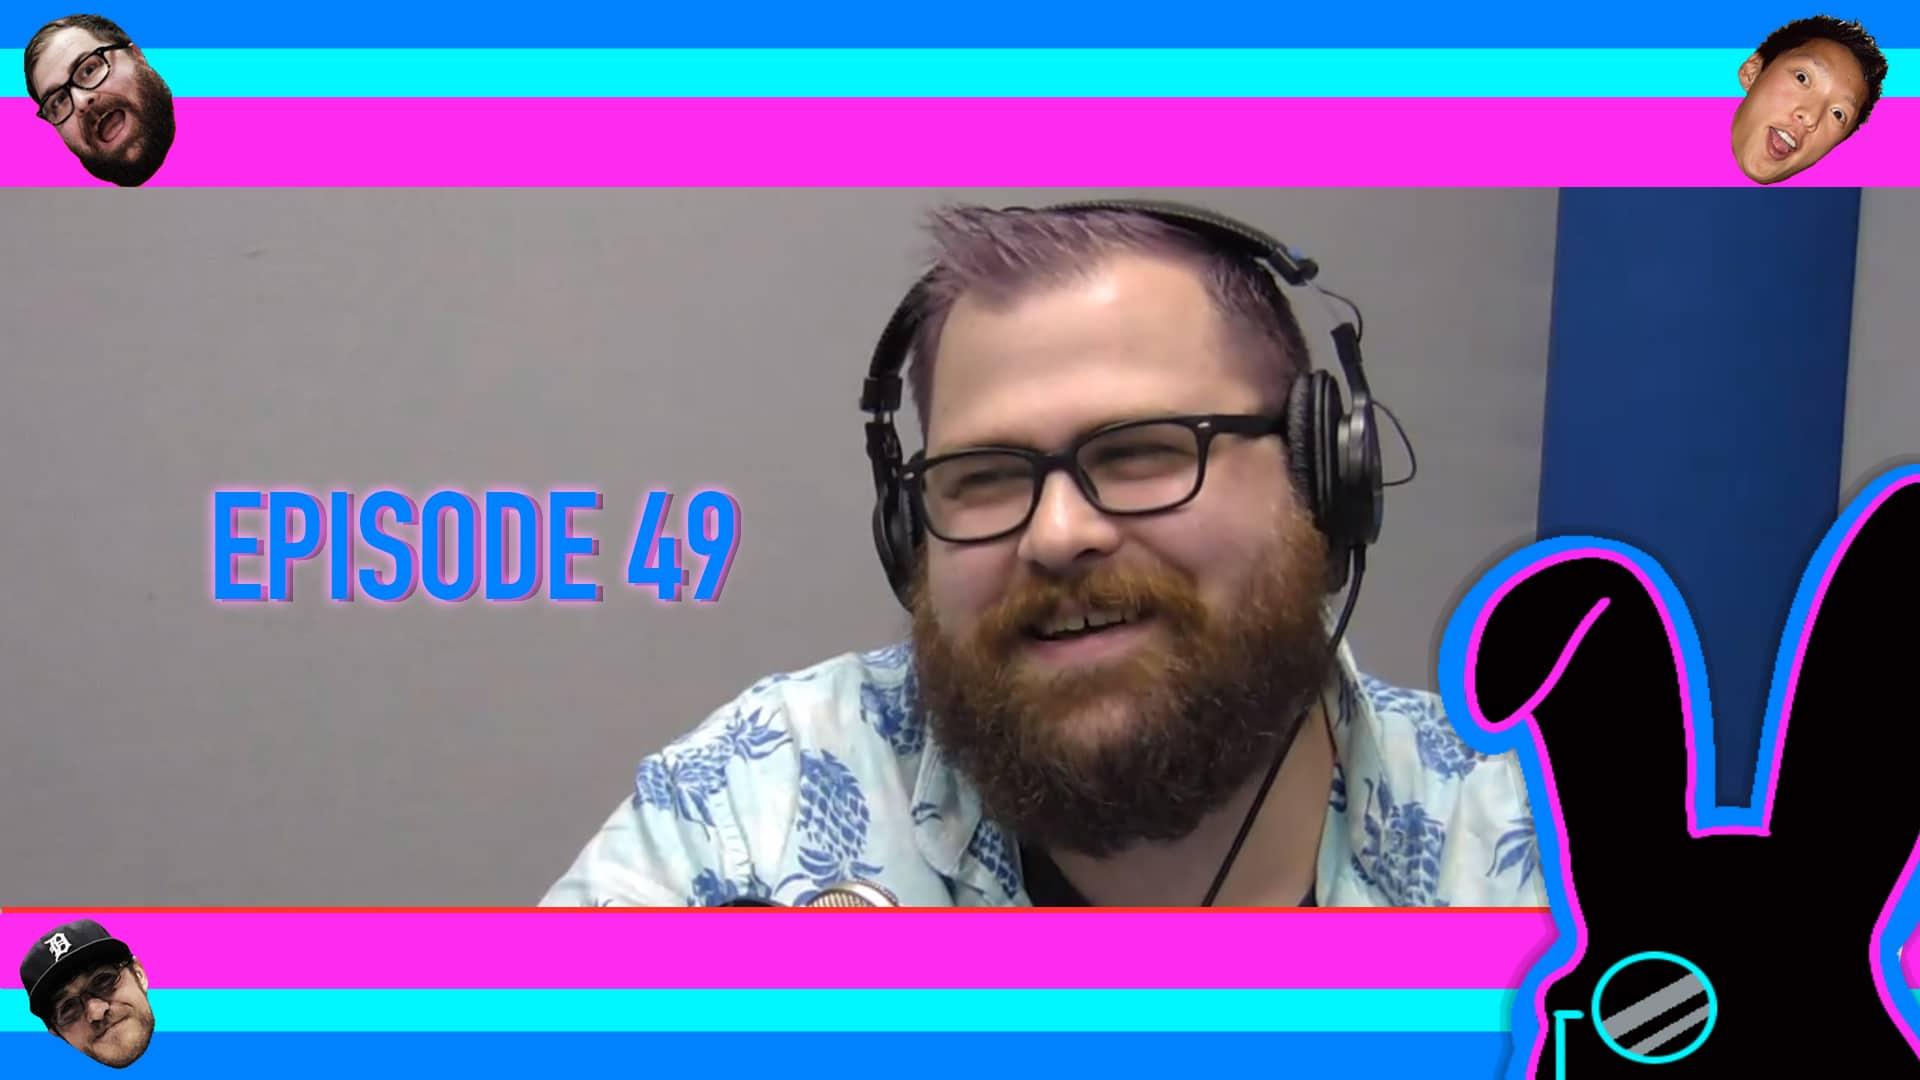 Geektainment Weekly - Episode 49